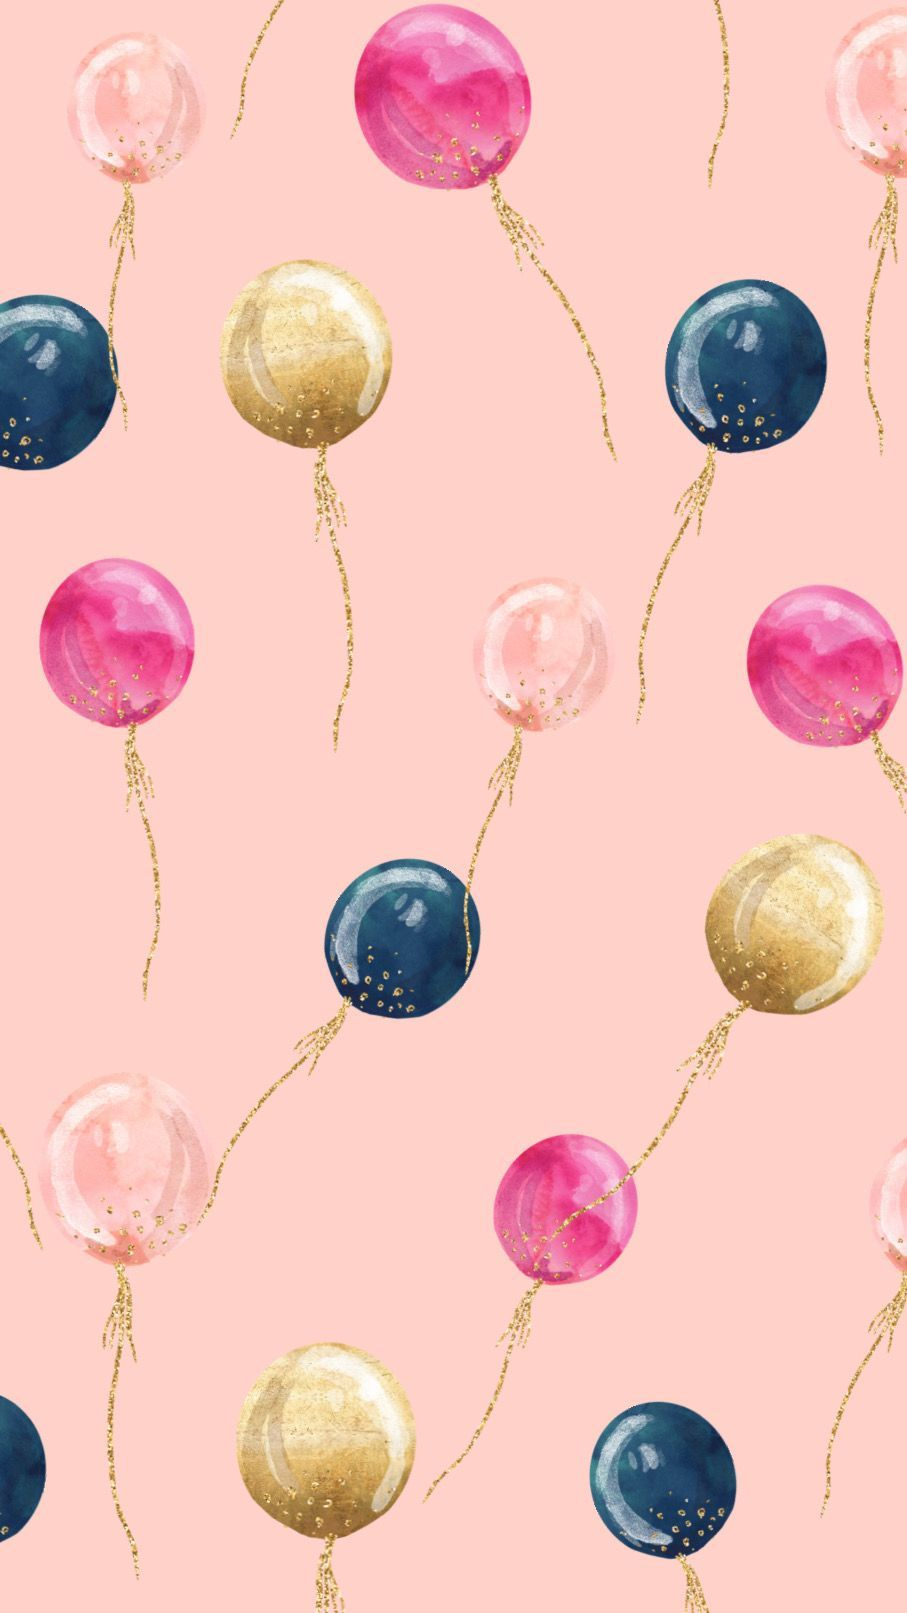 Birthday background wallpaper image by blue on خلفيات